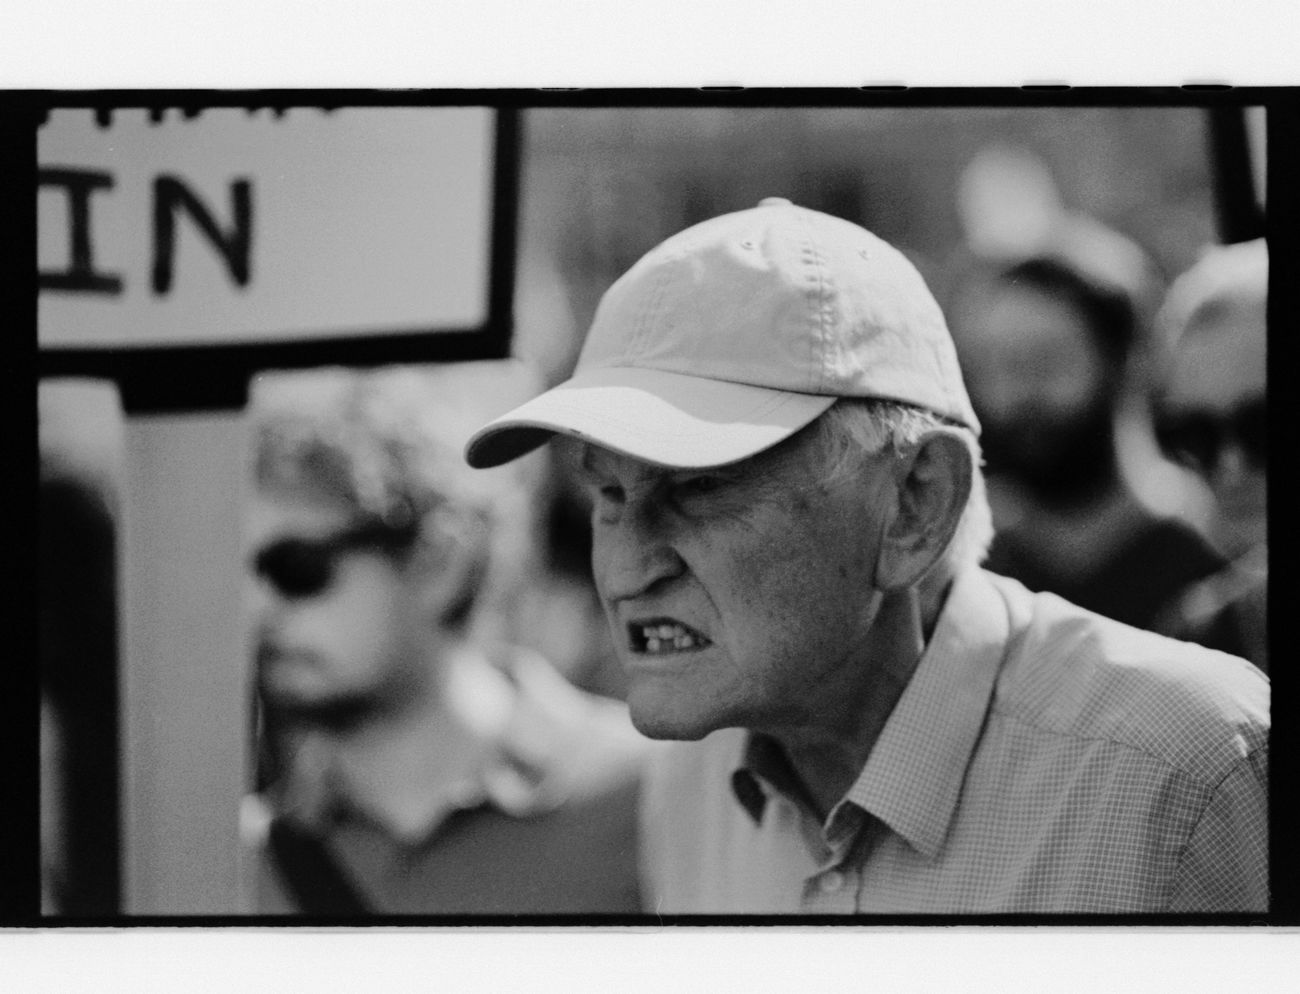 headshot, real people, men, portrait, focus on foreground